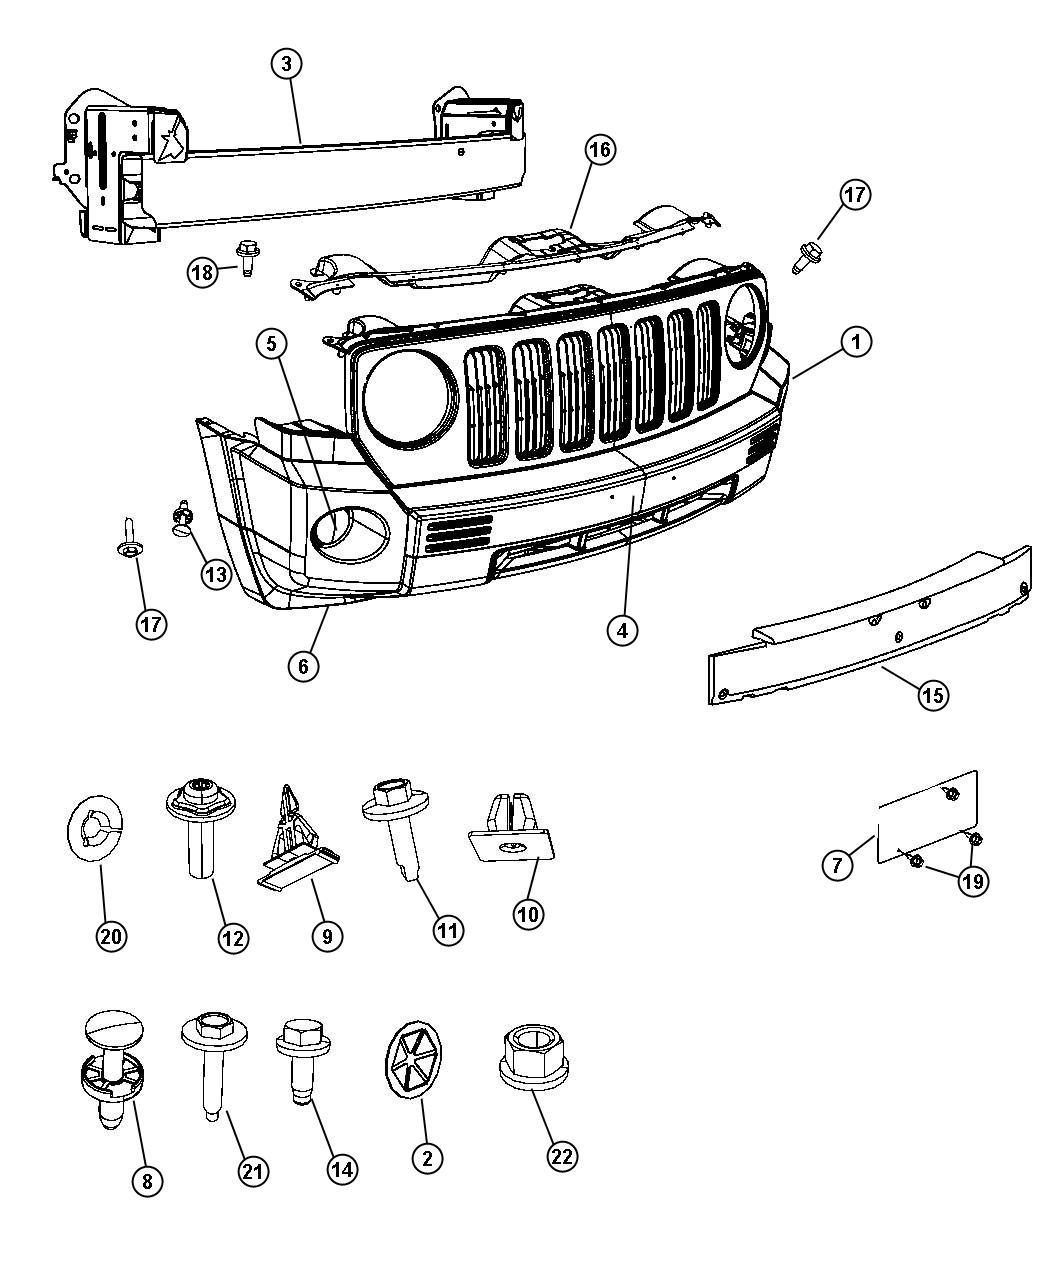 jeep front end parts diagram gold bohr of atom patriot 2007 bumper